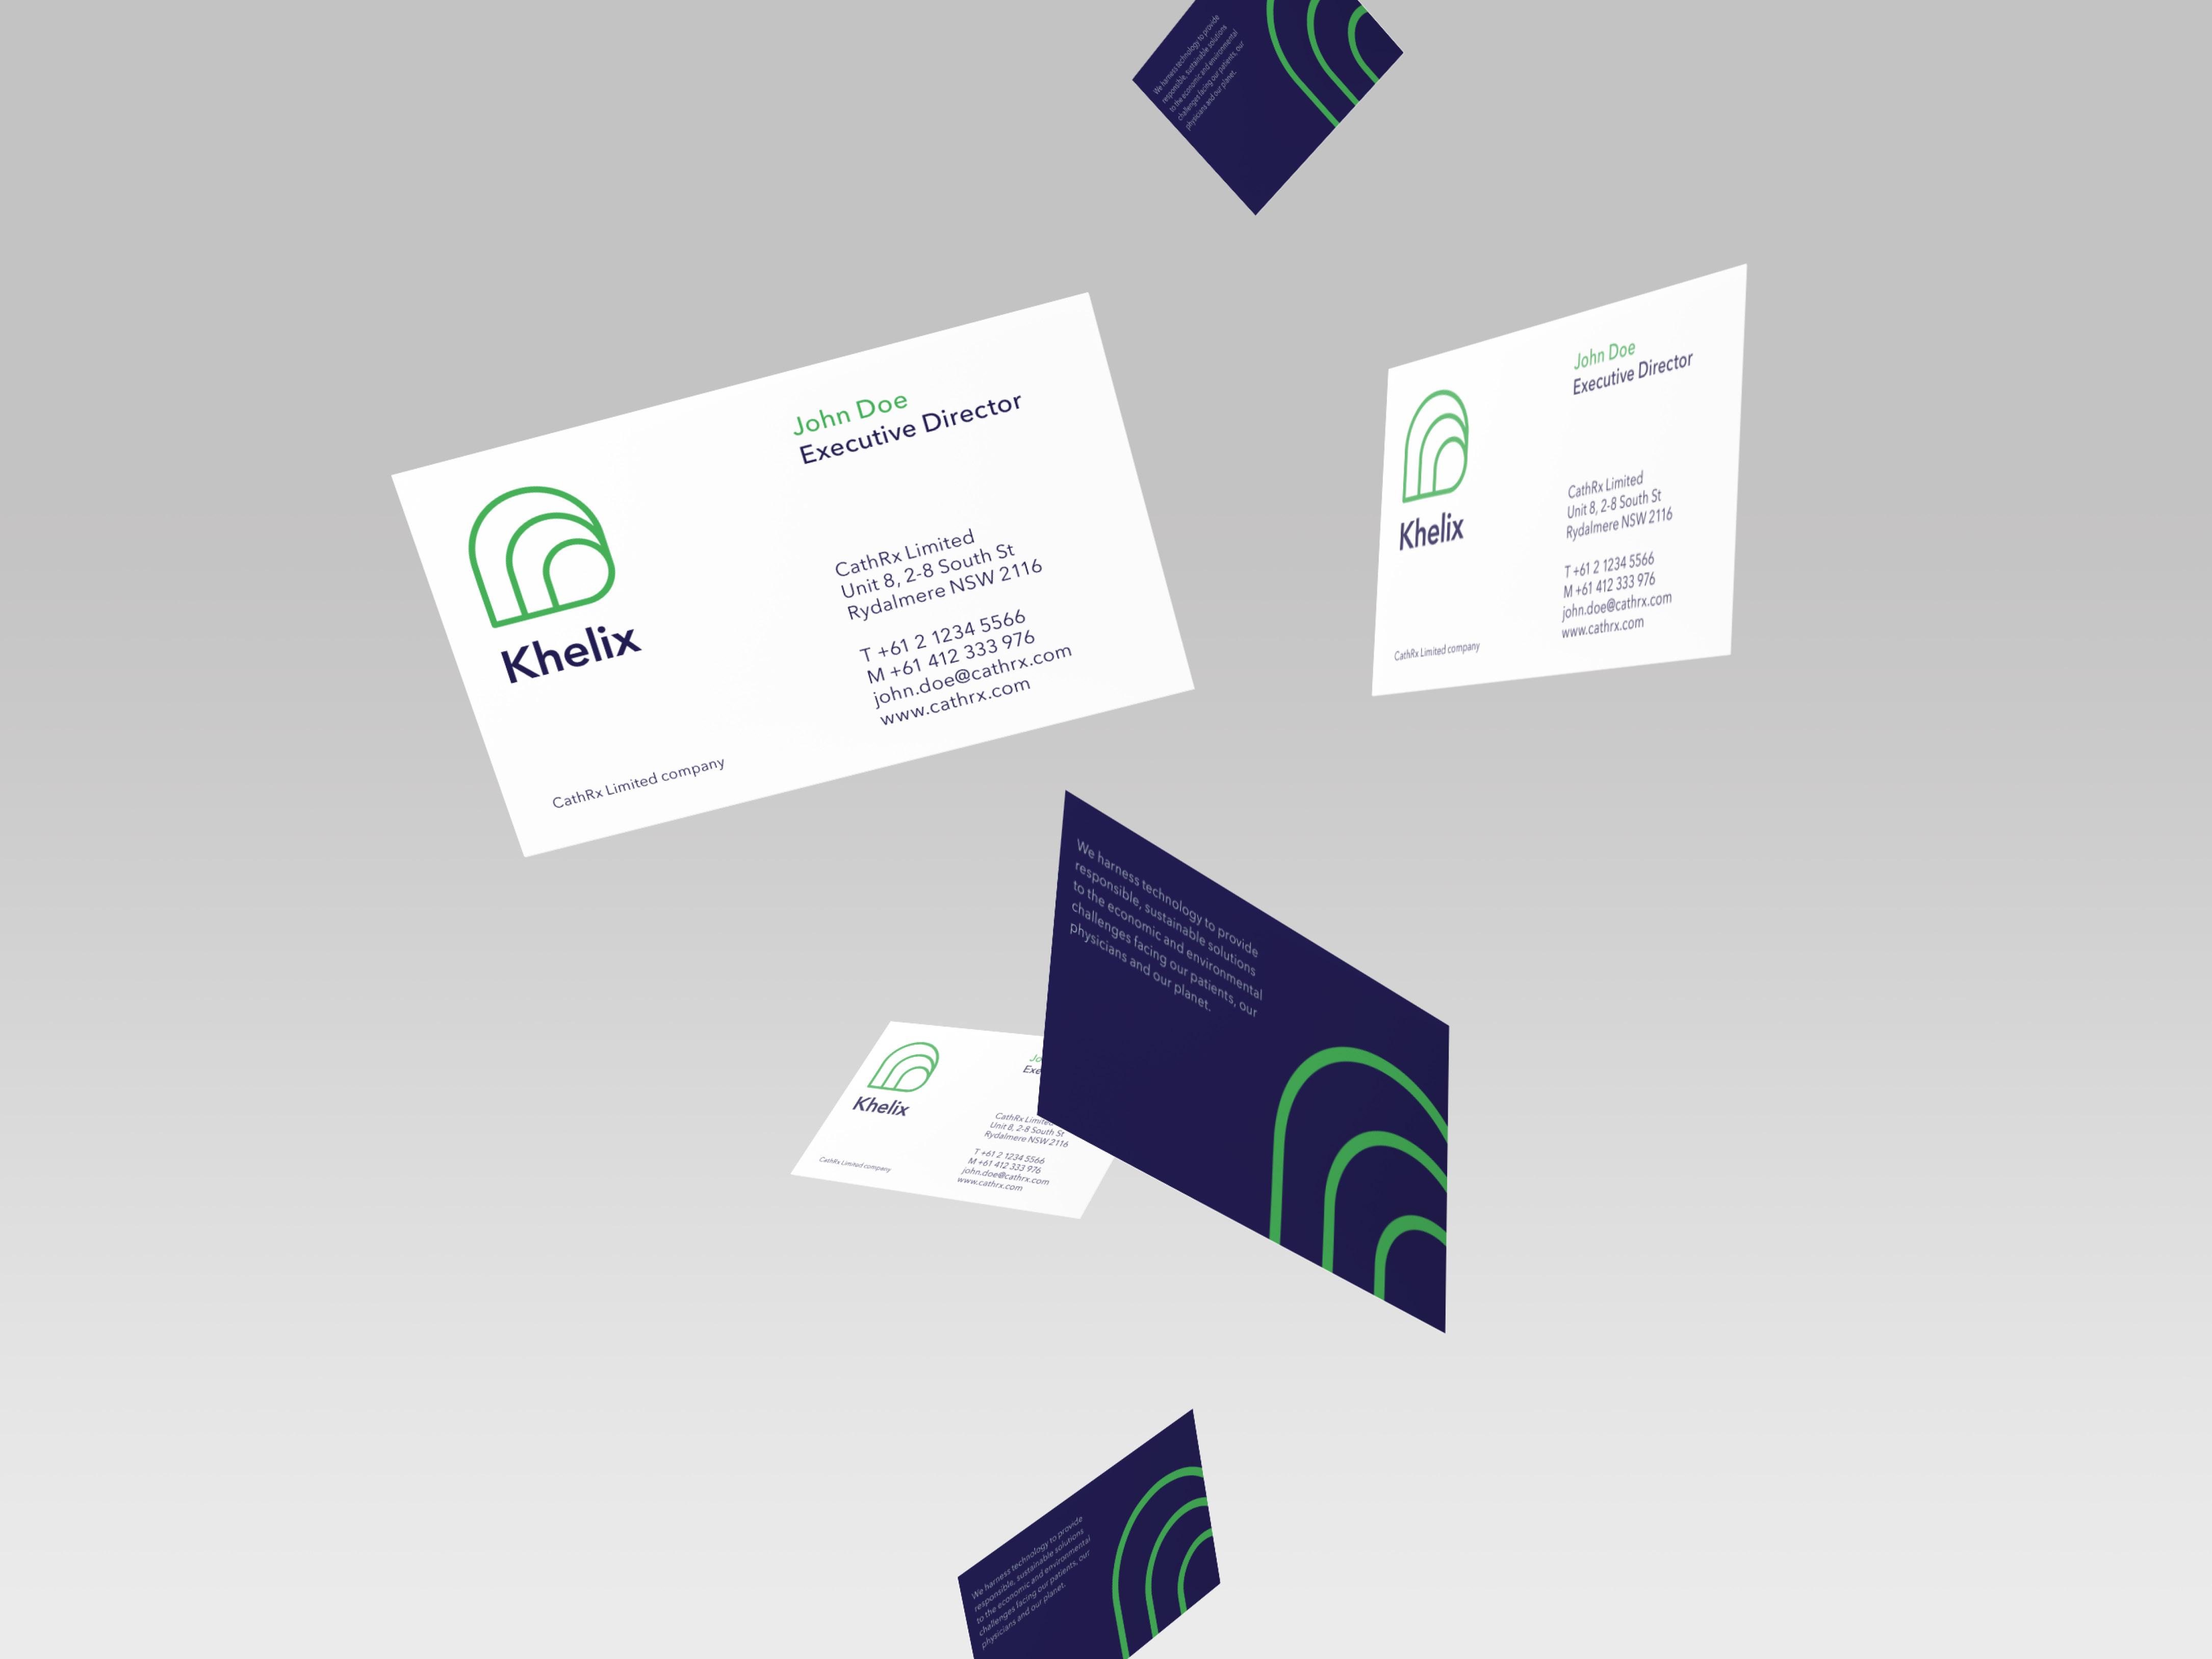 Khelix business cards